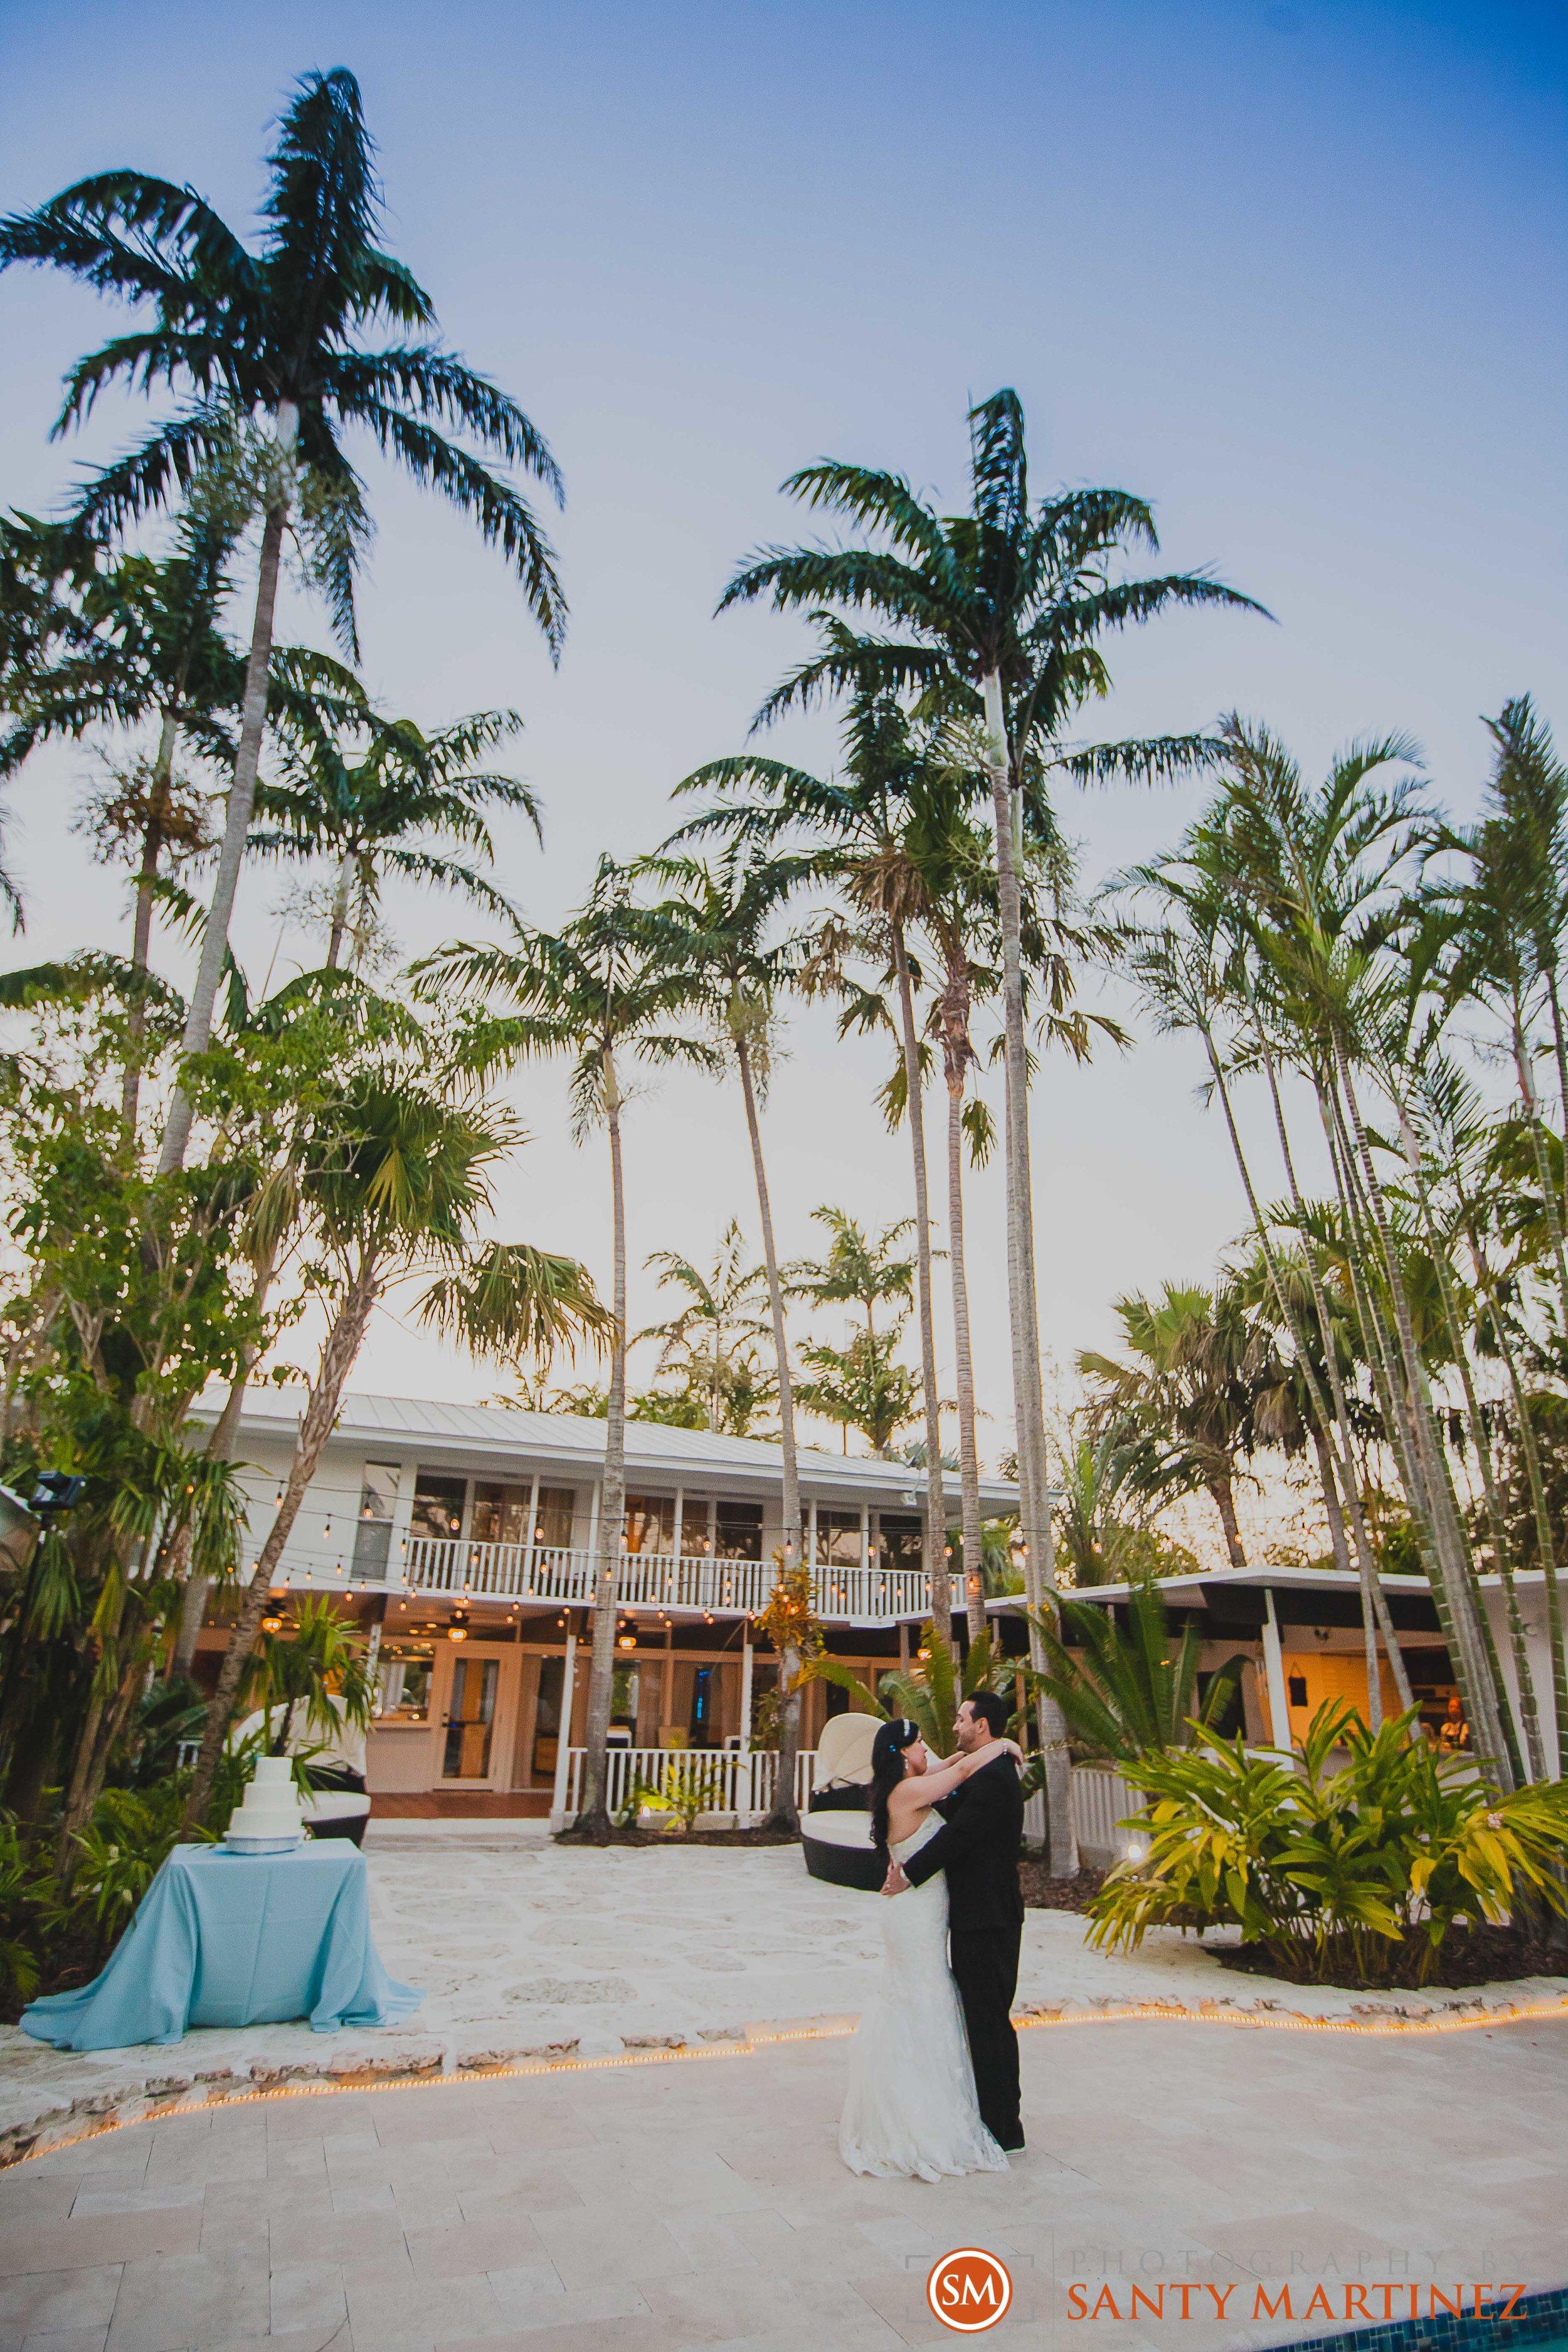 Wedding - Whimsical key West House - Photography by Santy Martinez-38.jpg